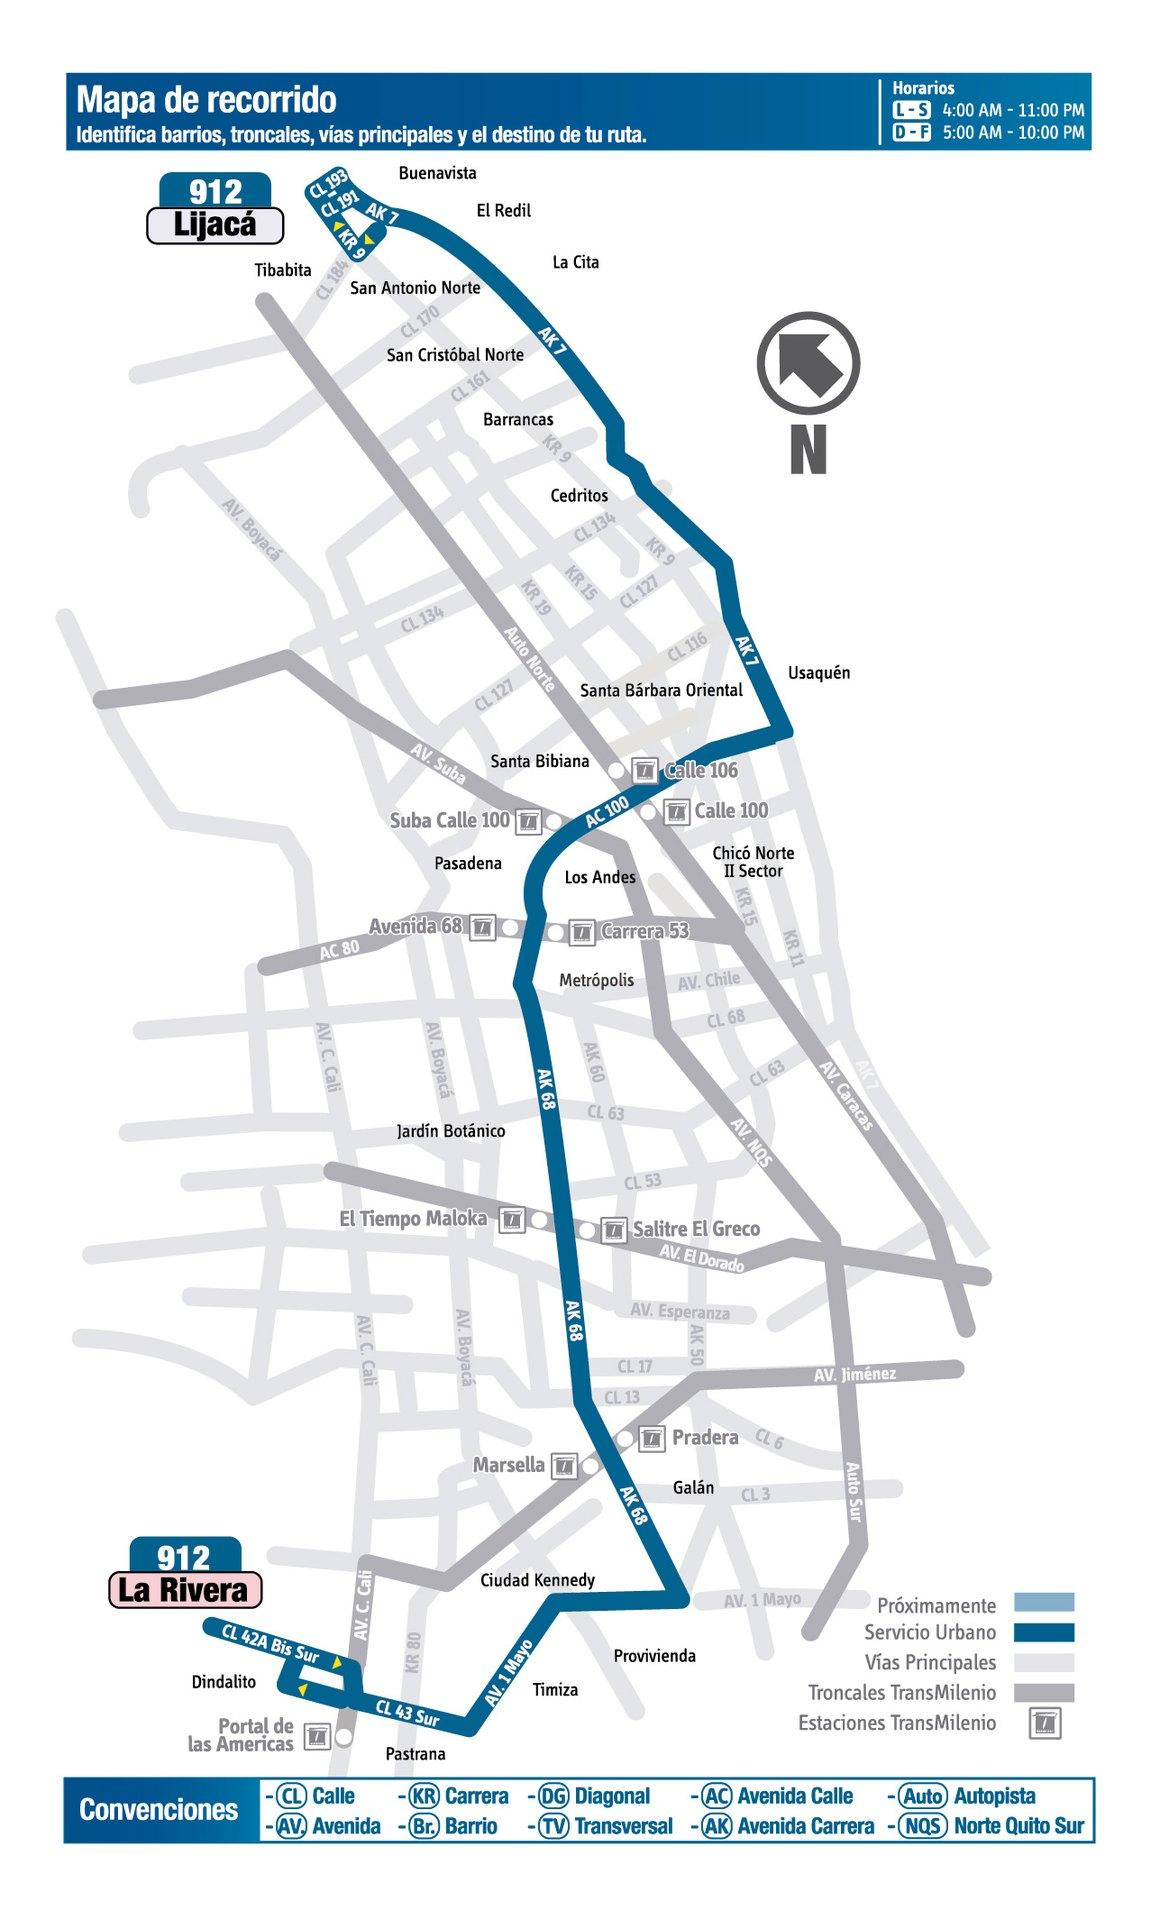 Ruta SITP: 912 Lijacá ↔ La Rivera [Urbana] 3